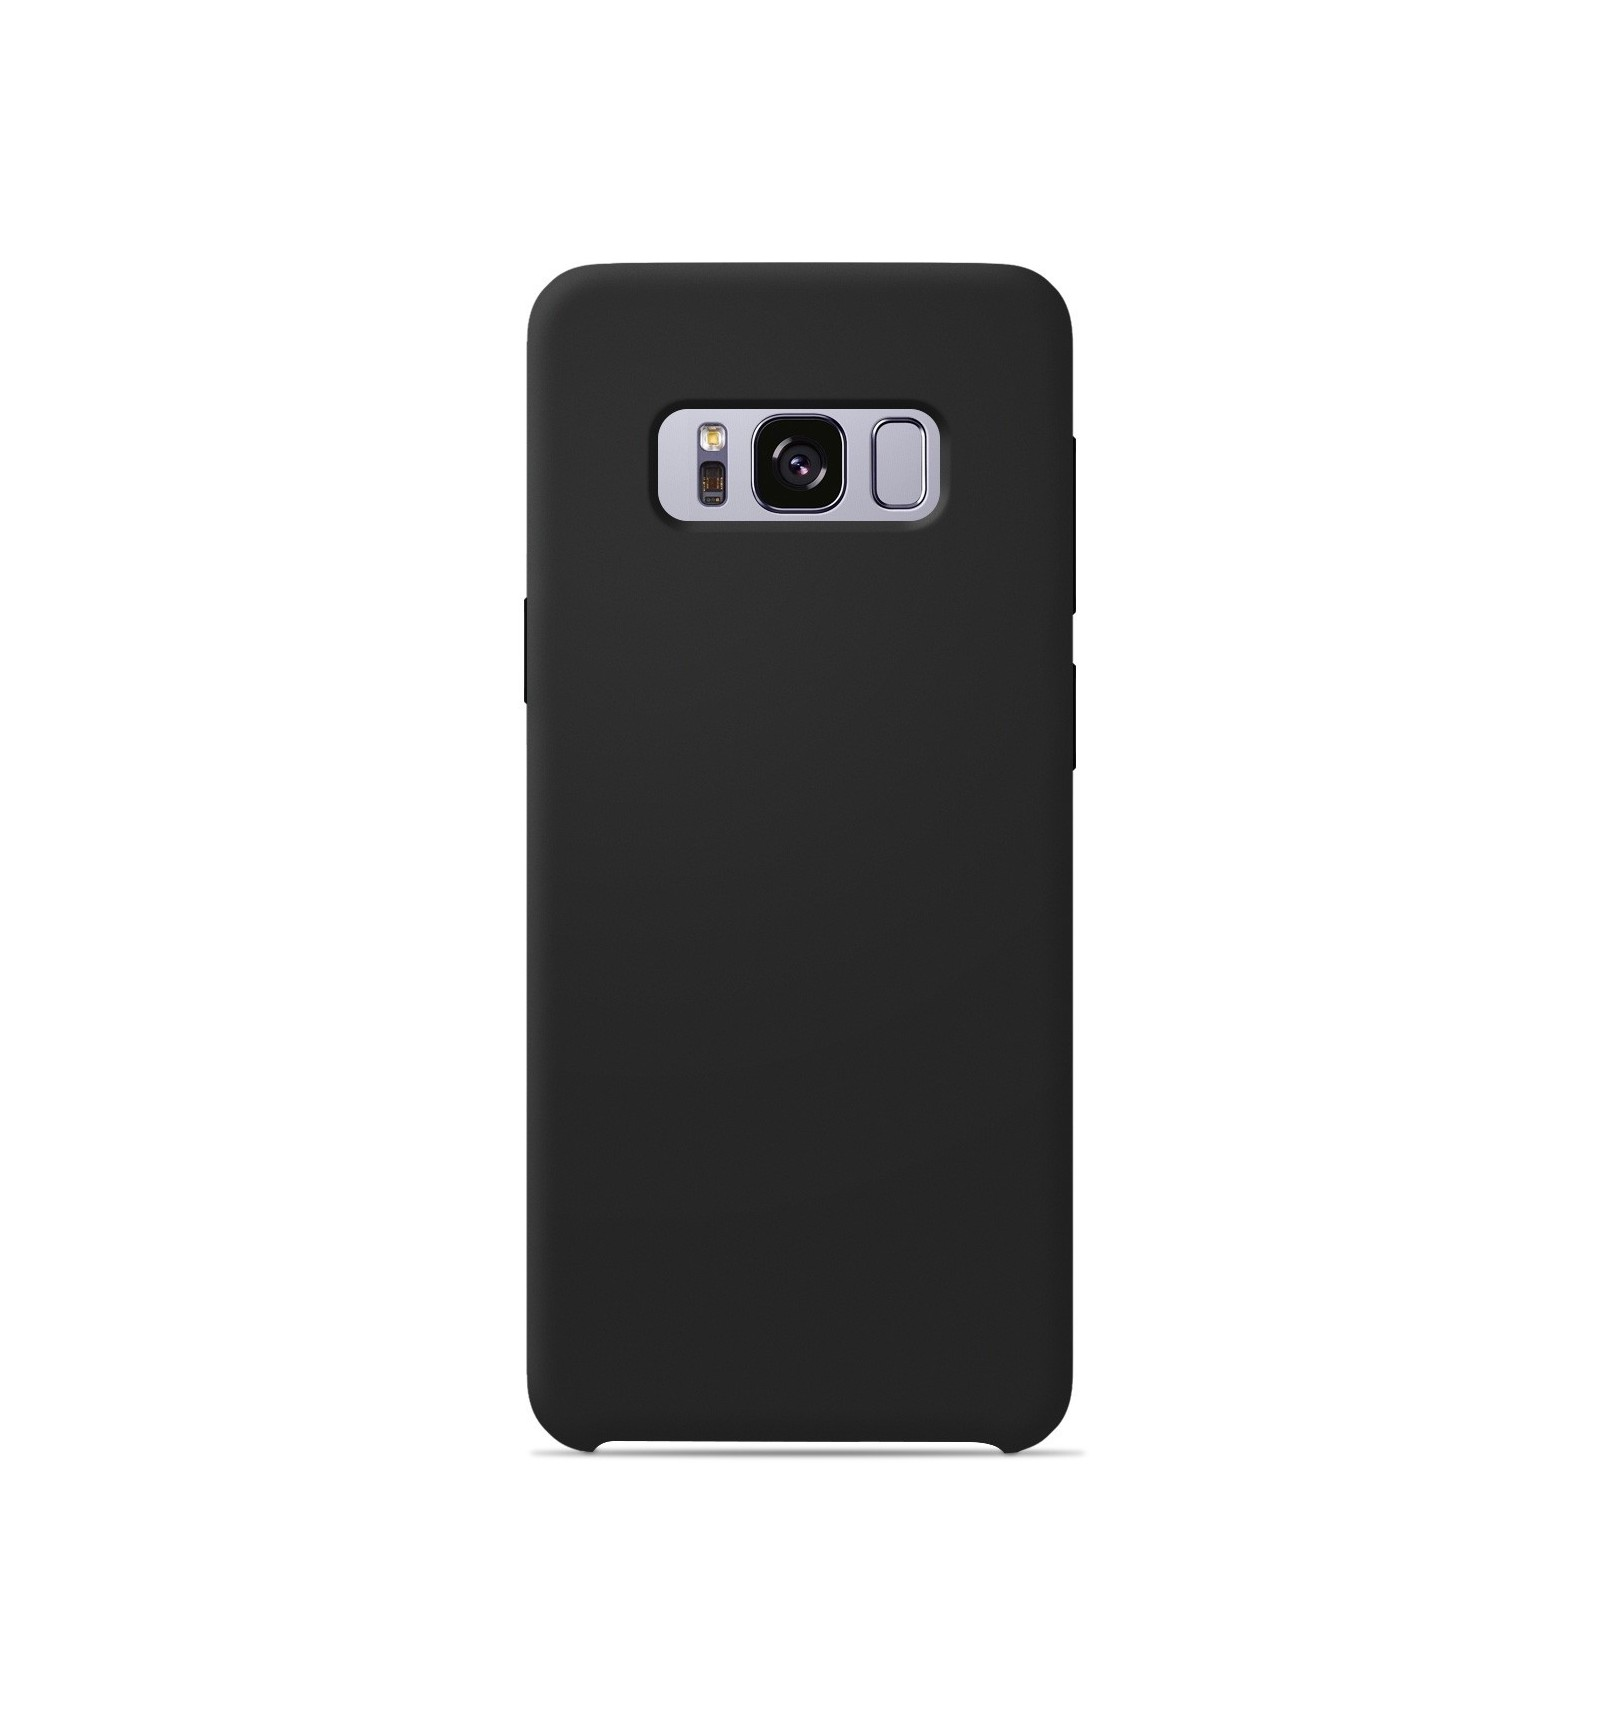 Coque Samsung Galaxy S8 Silicone Soft Touch - Noir